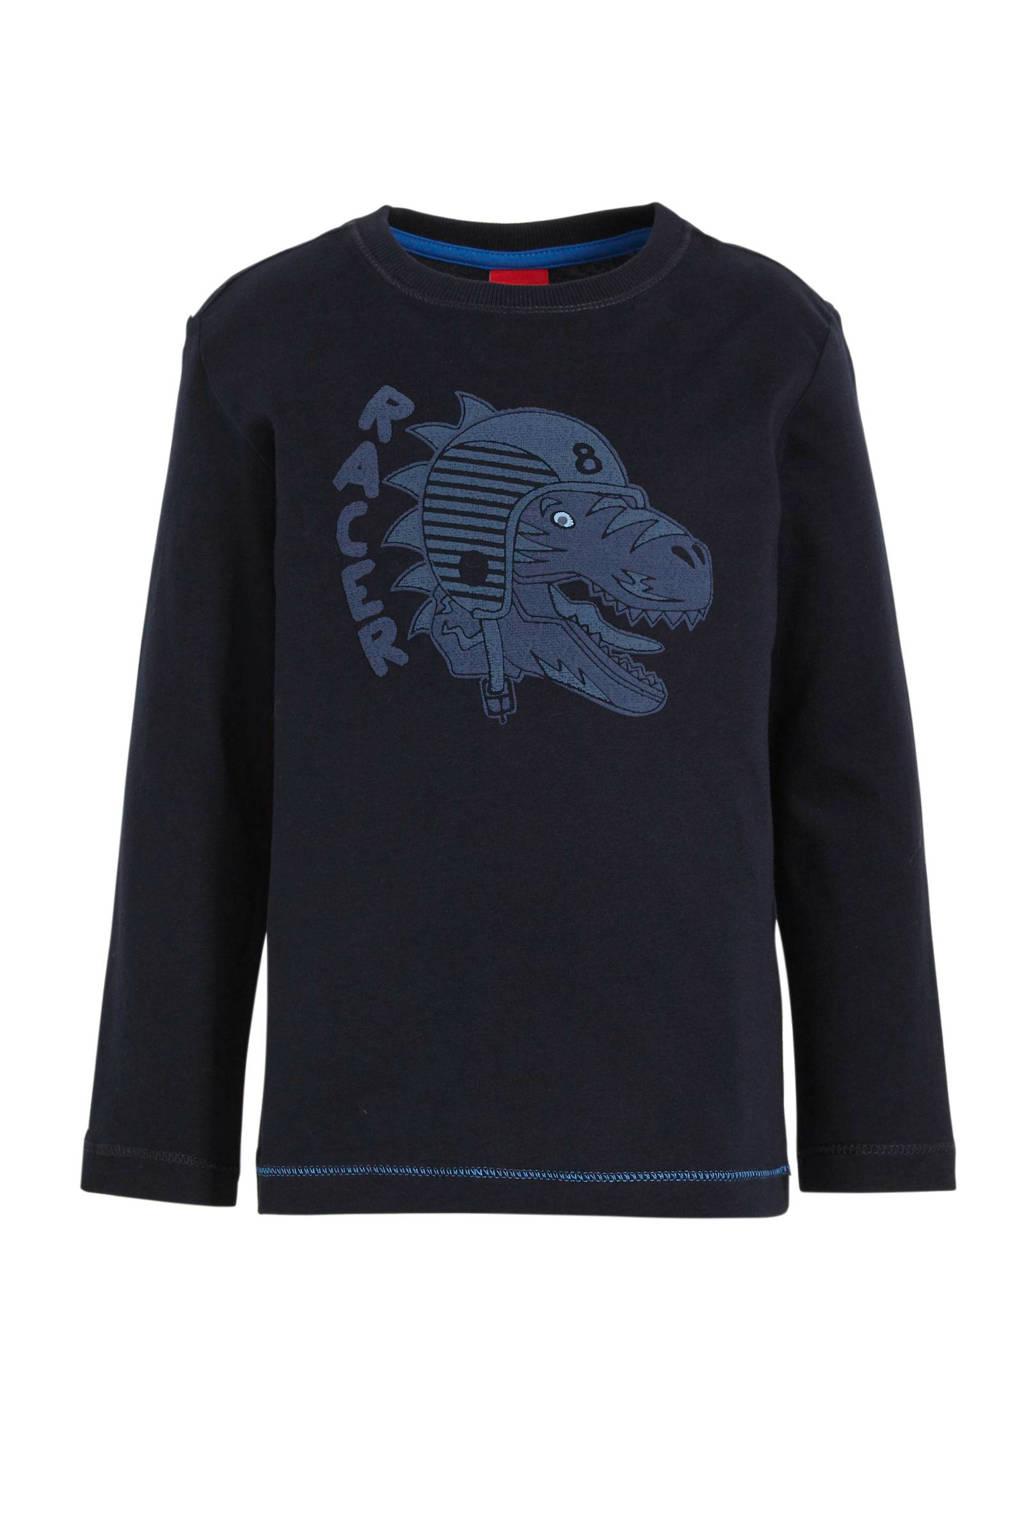 s.Oliver longsleeve met printopdruk en borduursels donkerblauw/blauw, Donkerblauw/blauw